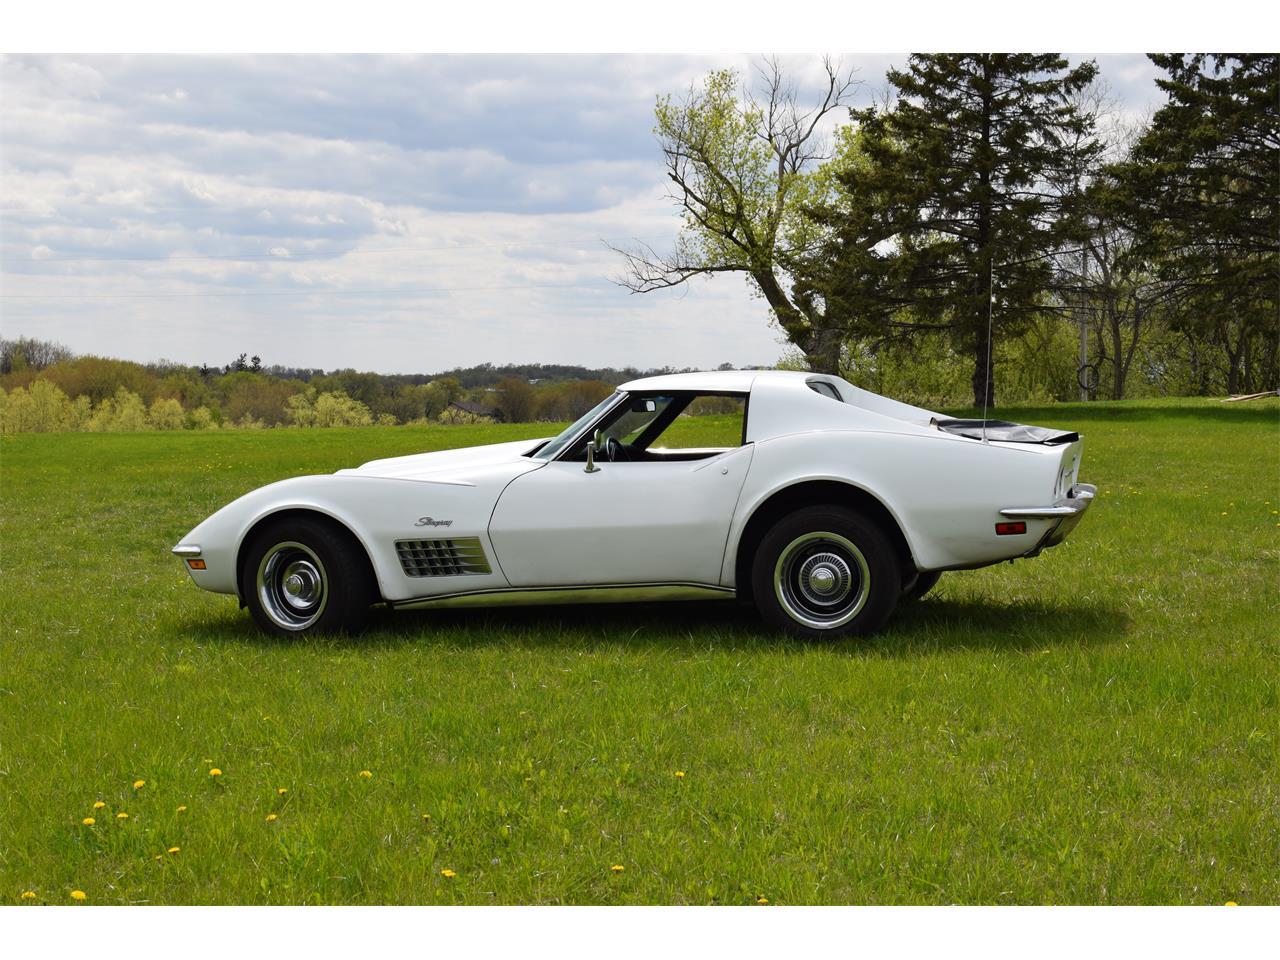 Large Picture of Classic '71 Chevrolet Corvette located in Minnesota - $14,500.00 - Q4GJ